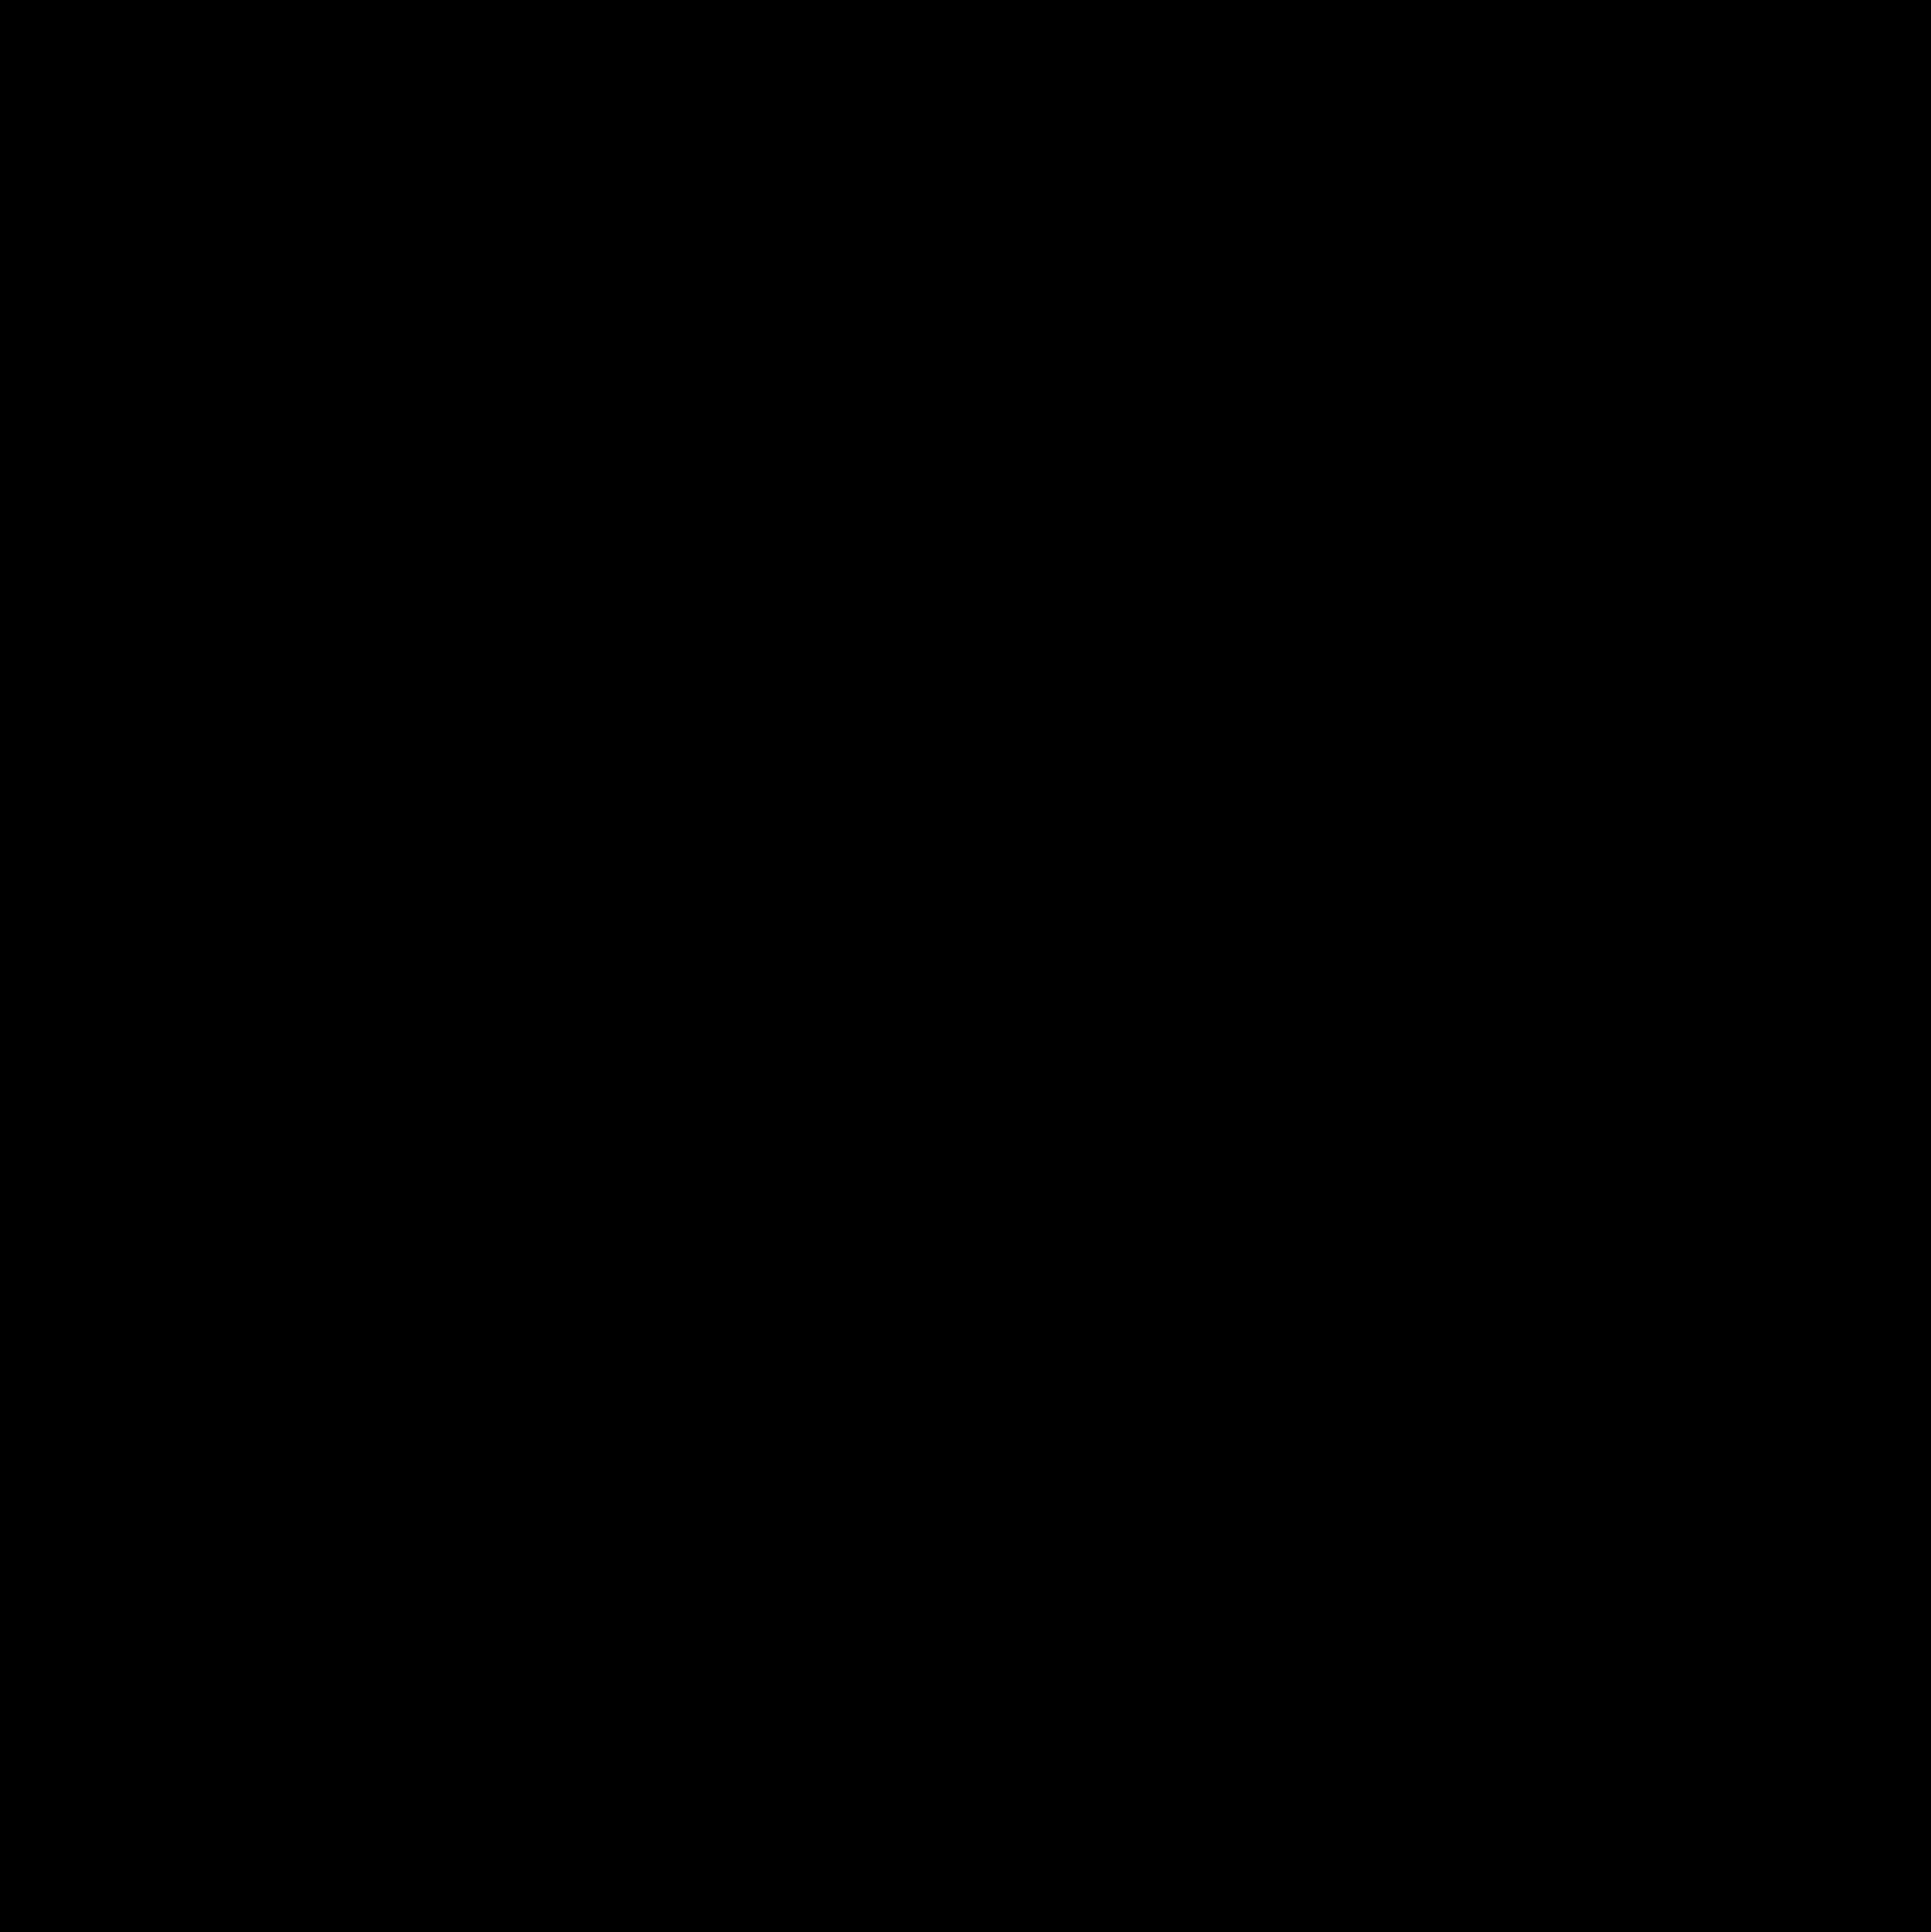 Spider Web Circular By Crazyterabyte